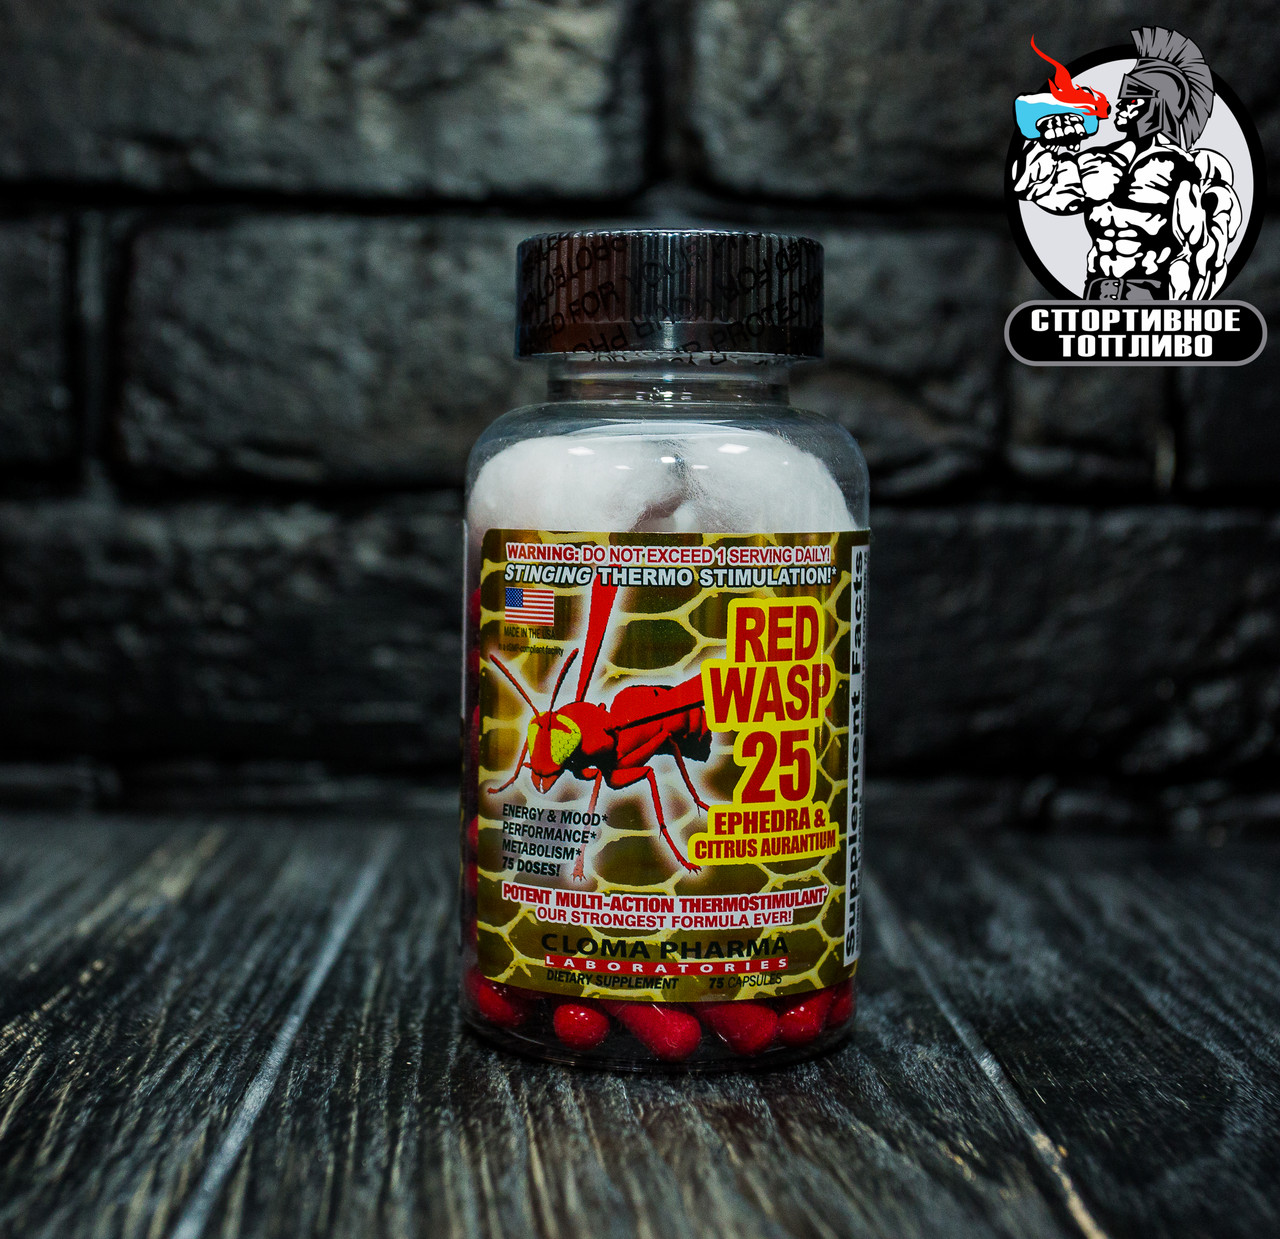 "Жиросжигатель - от Cloma Pharma ""Red Wasp"" 25 Eph (75 капс)"